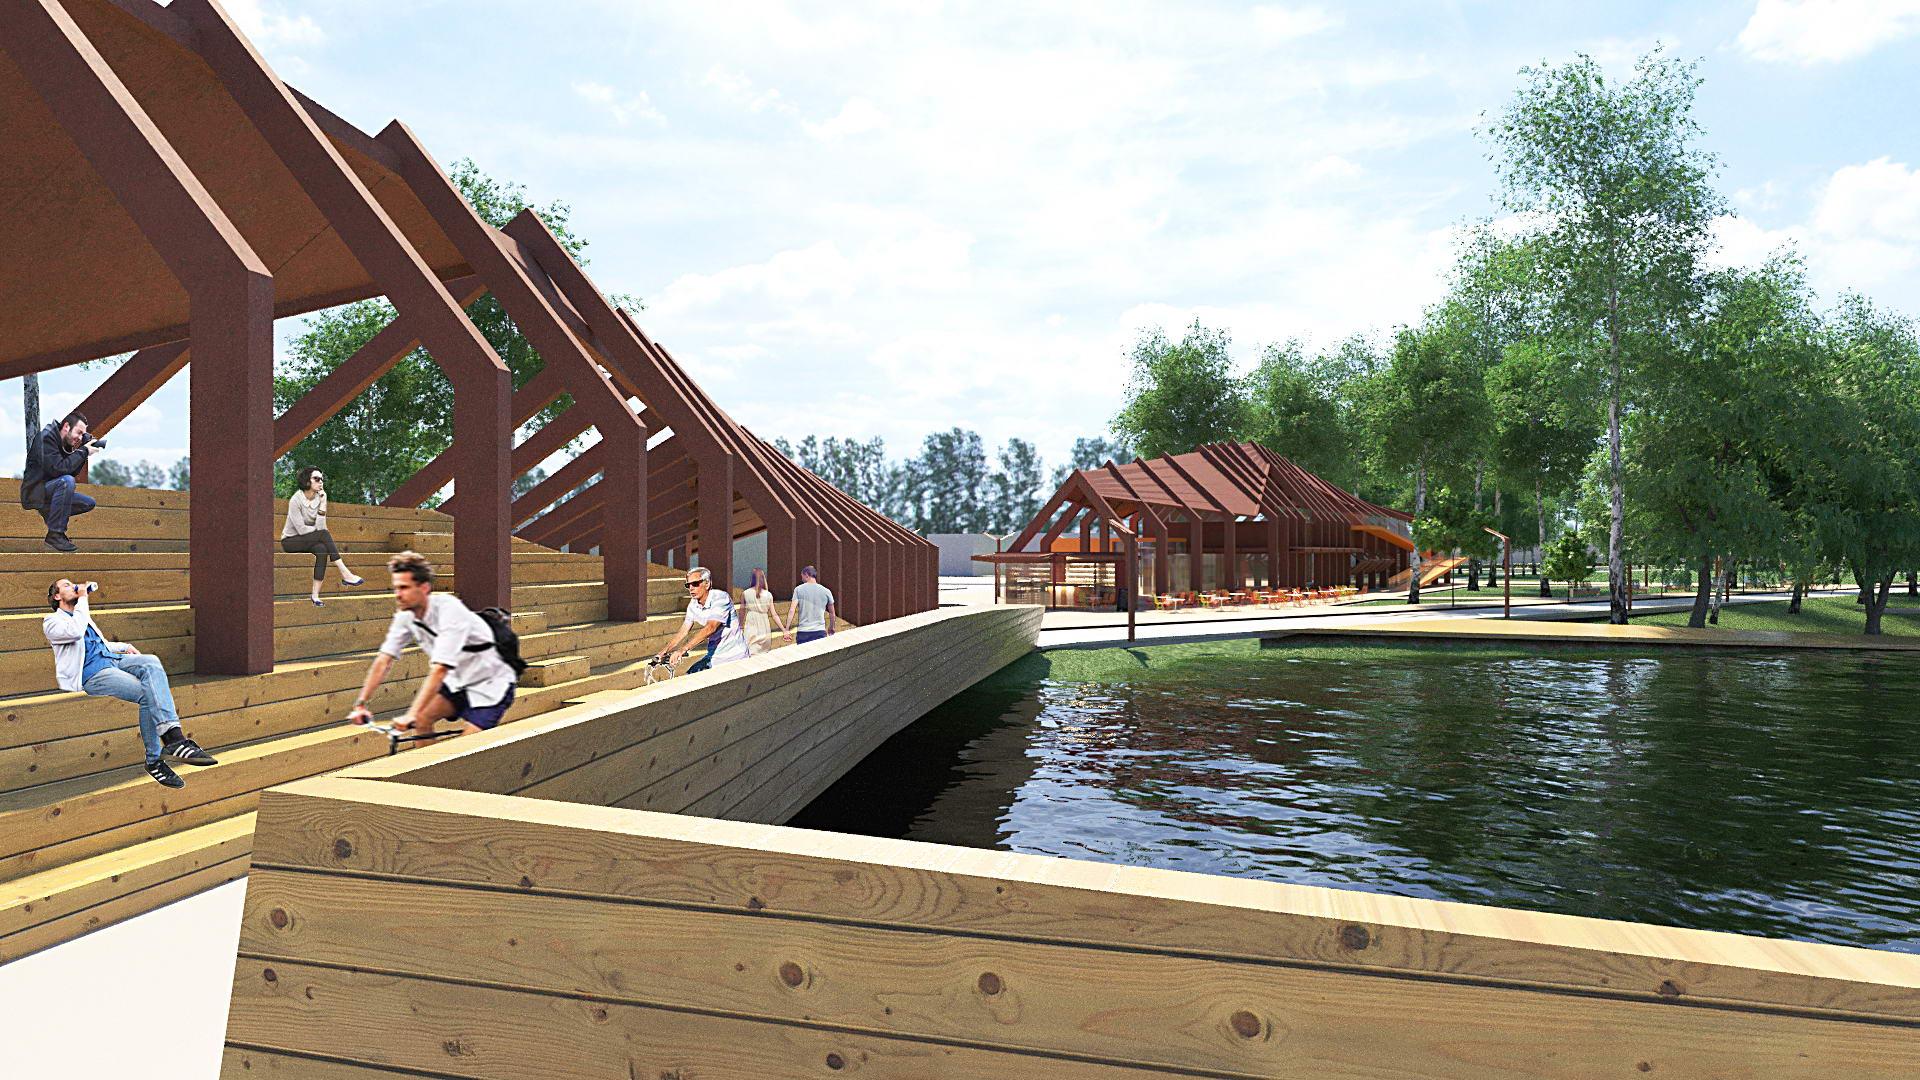 https://nbc-arhitect.ro/wp-content/uploads/2020/10/NBC-Arhitect-_-contests-_-Kinetik-Park-_-Cluj-Napoca-Romania_12.jpg